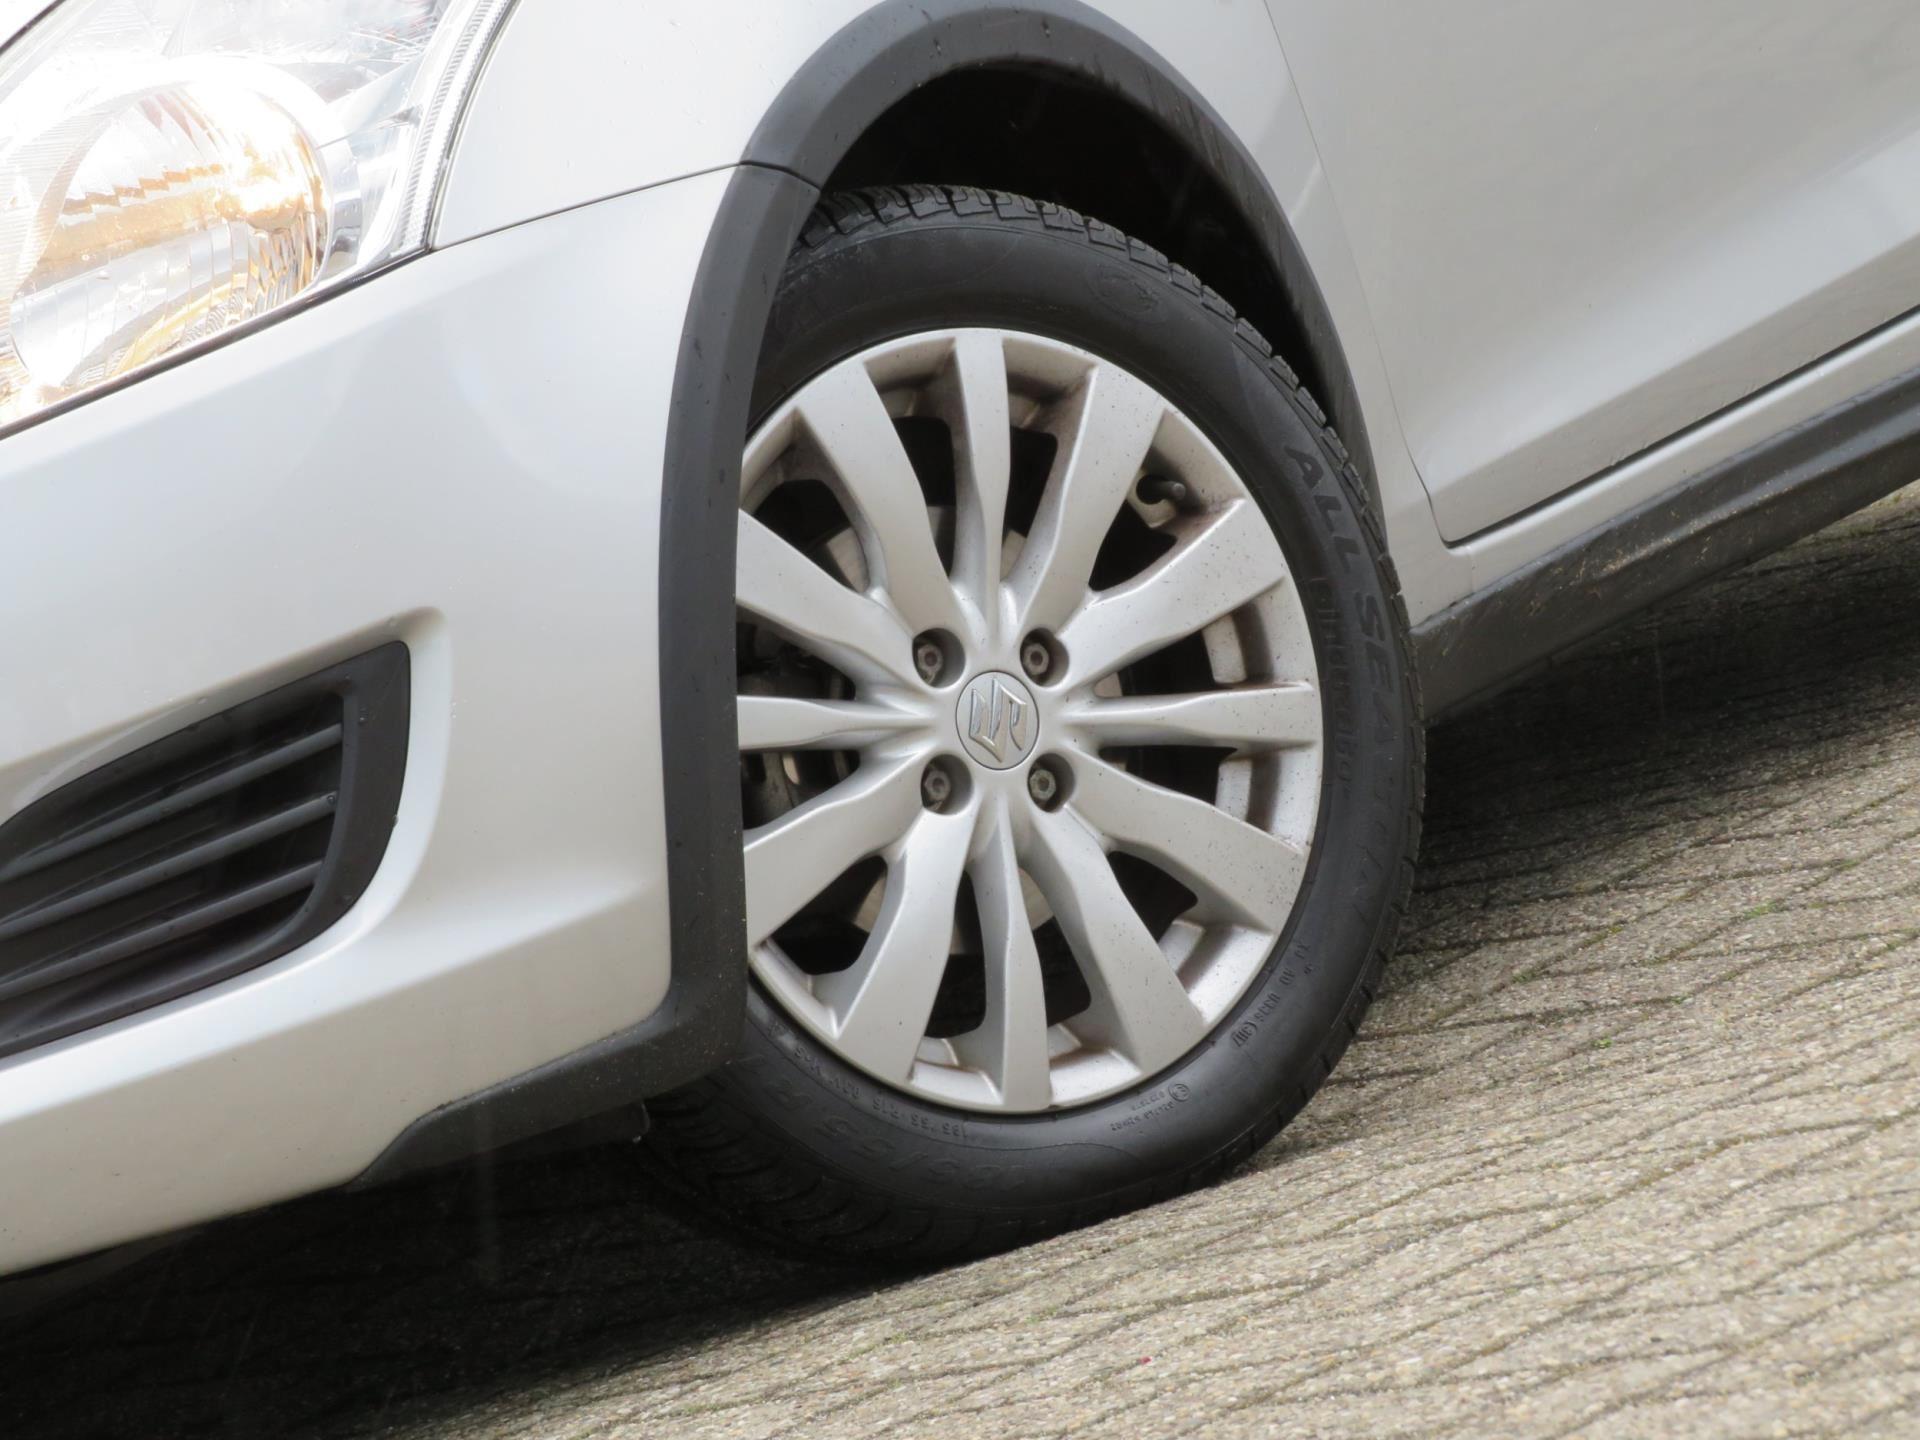 Suzuki Swift occasion - Autobedrijf H. Kroon Veenendaal B.V.